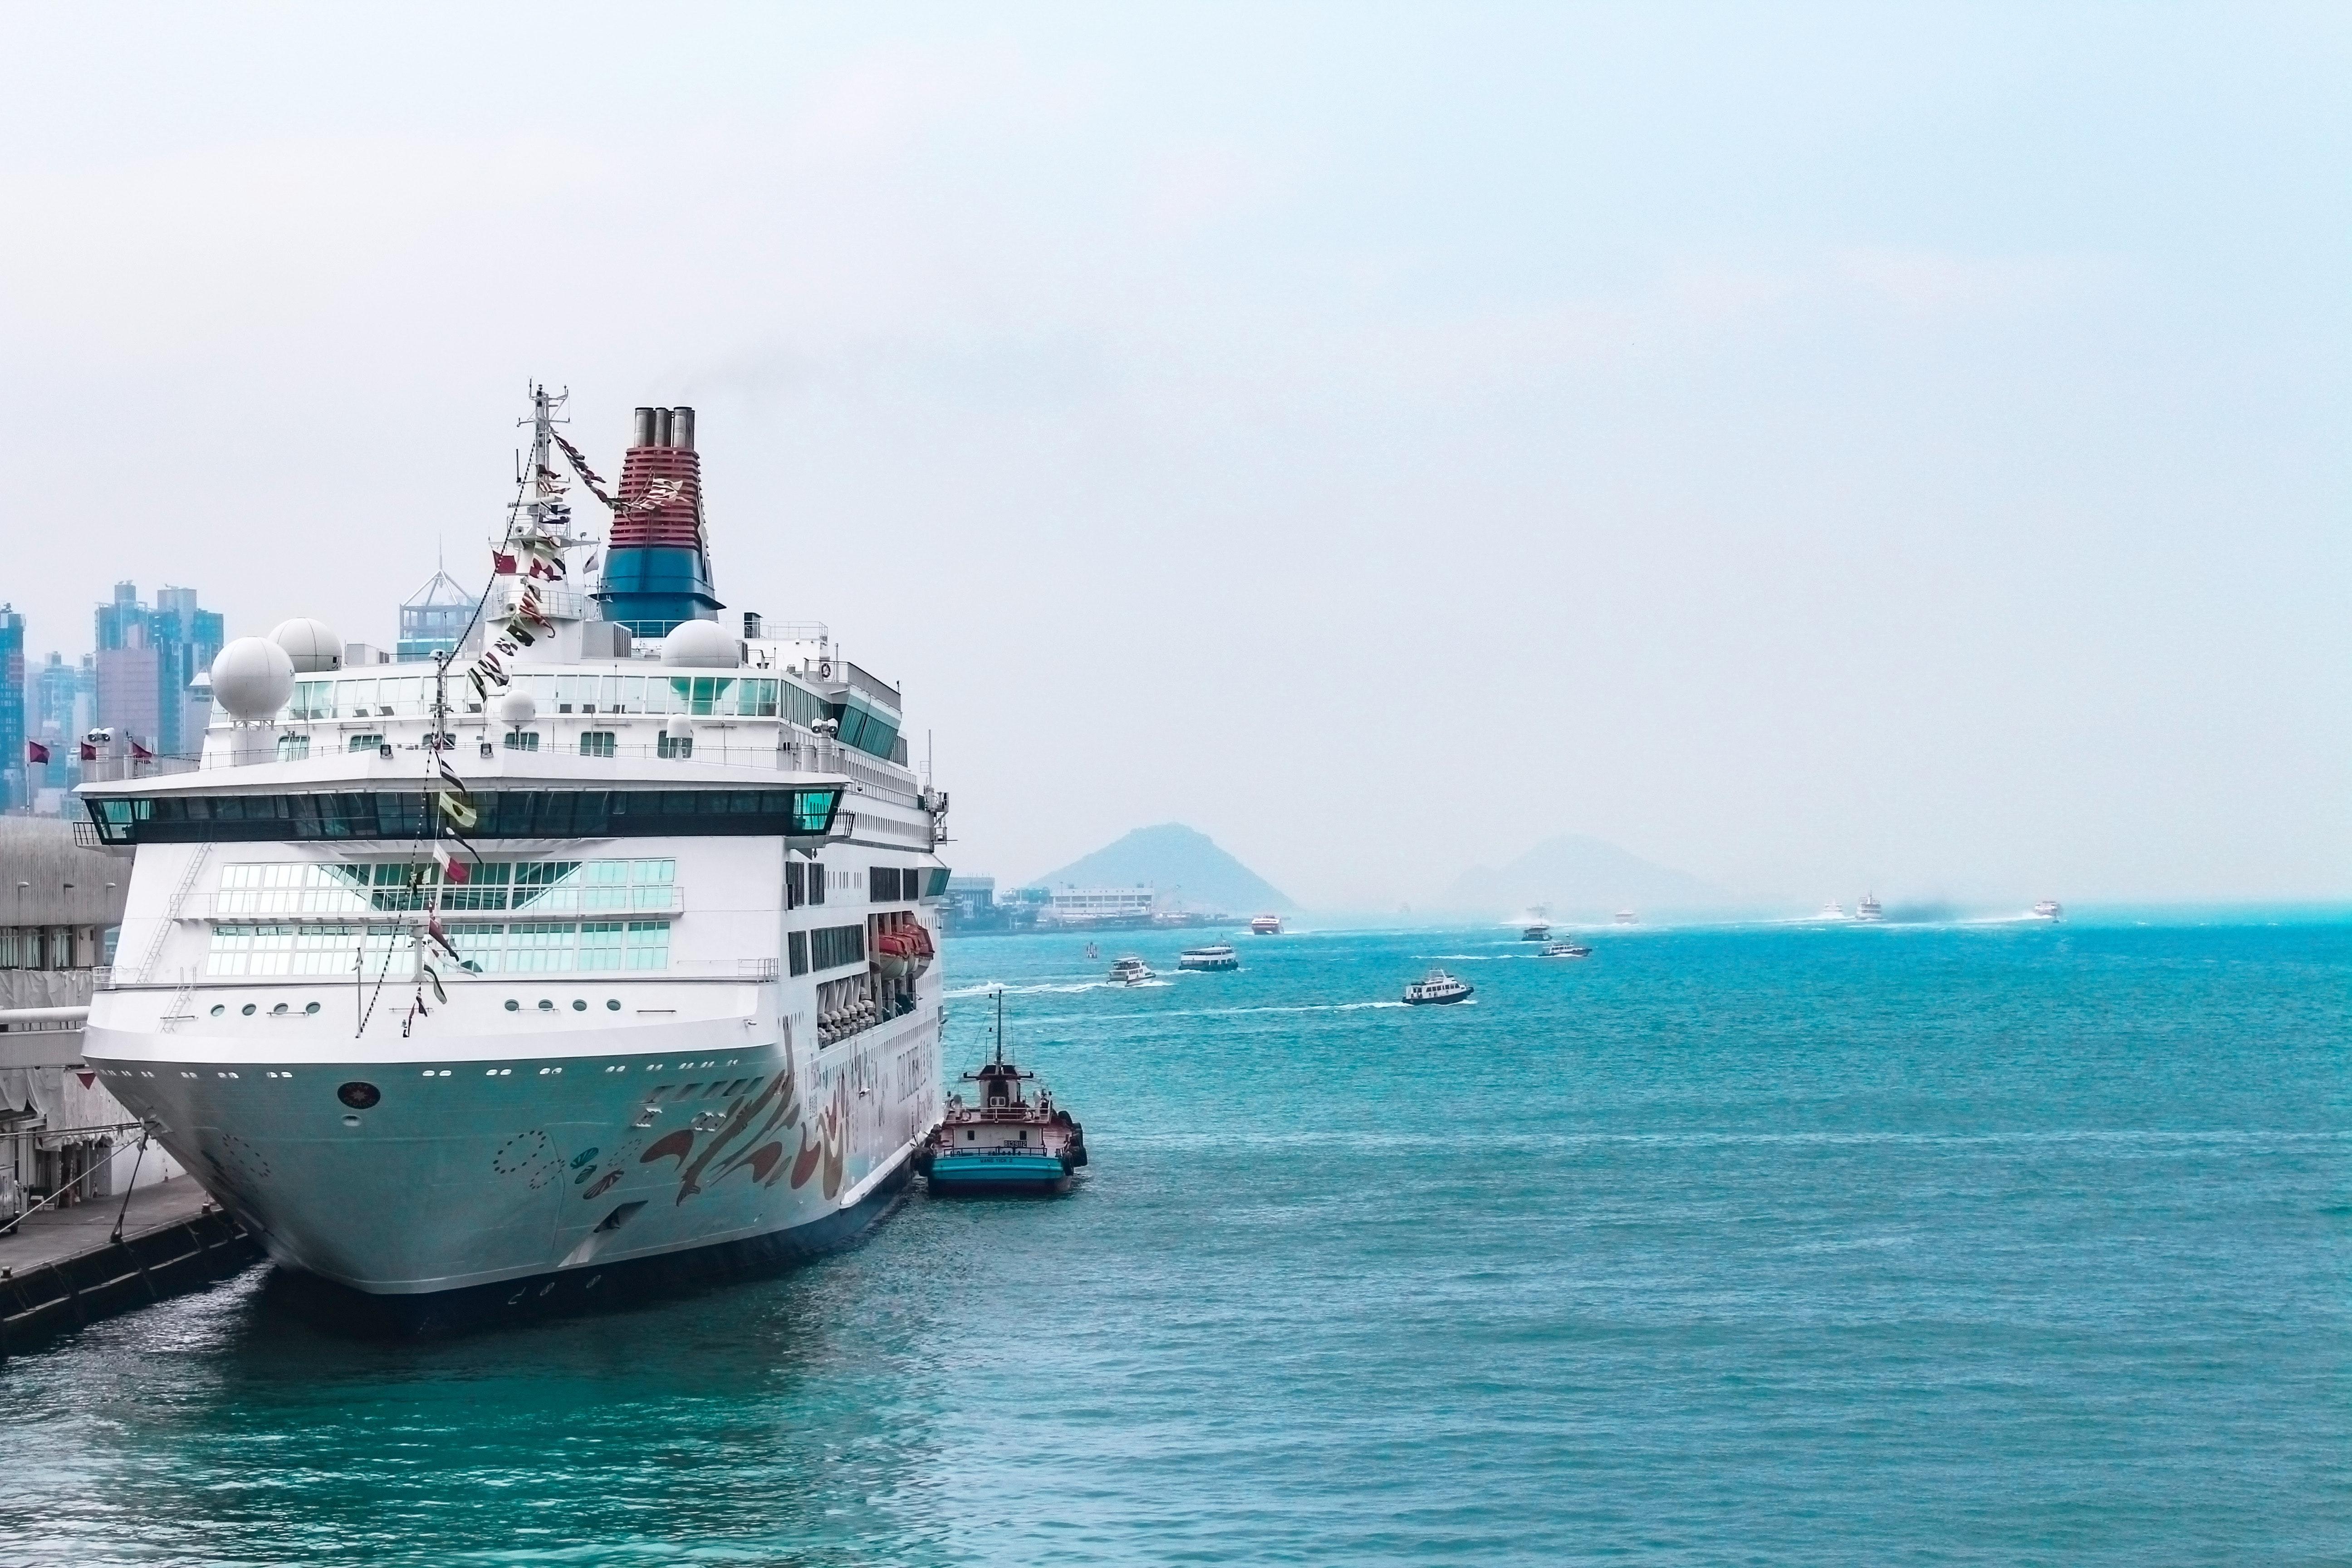 White cruise ship docking in port photo